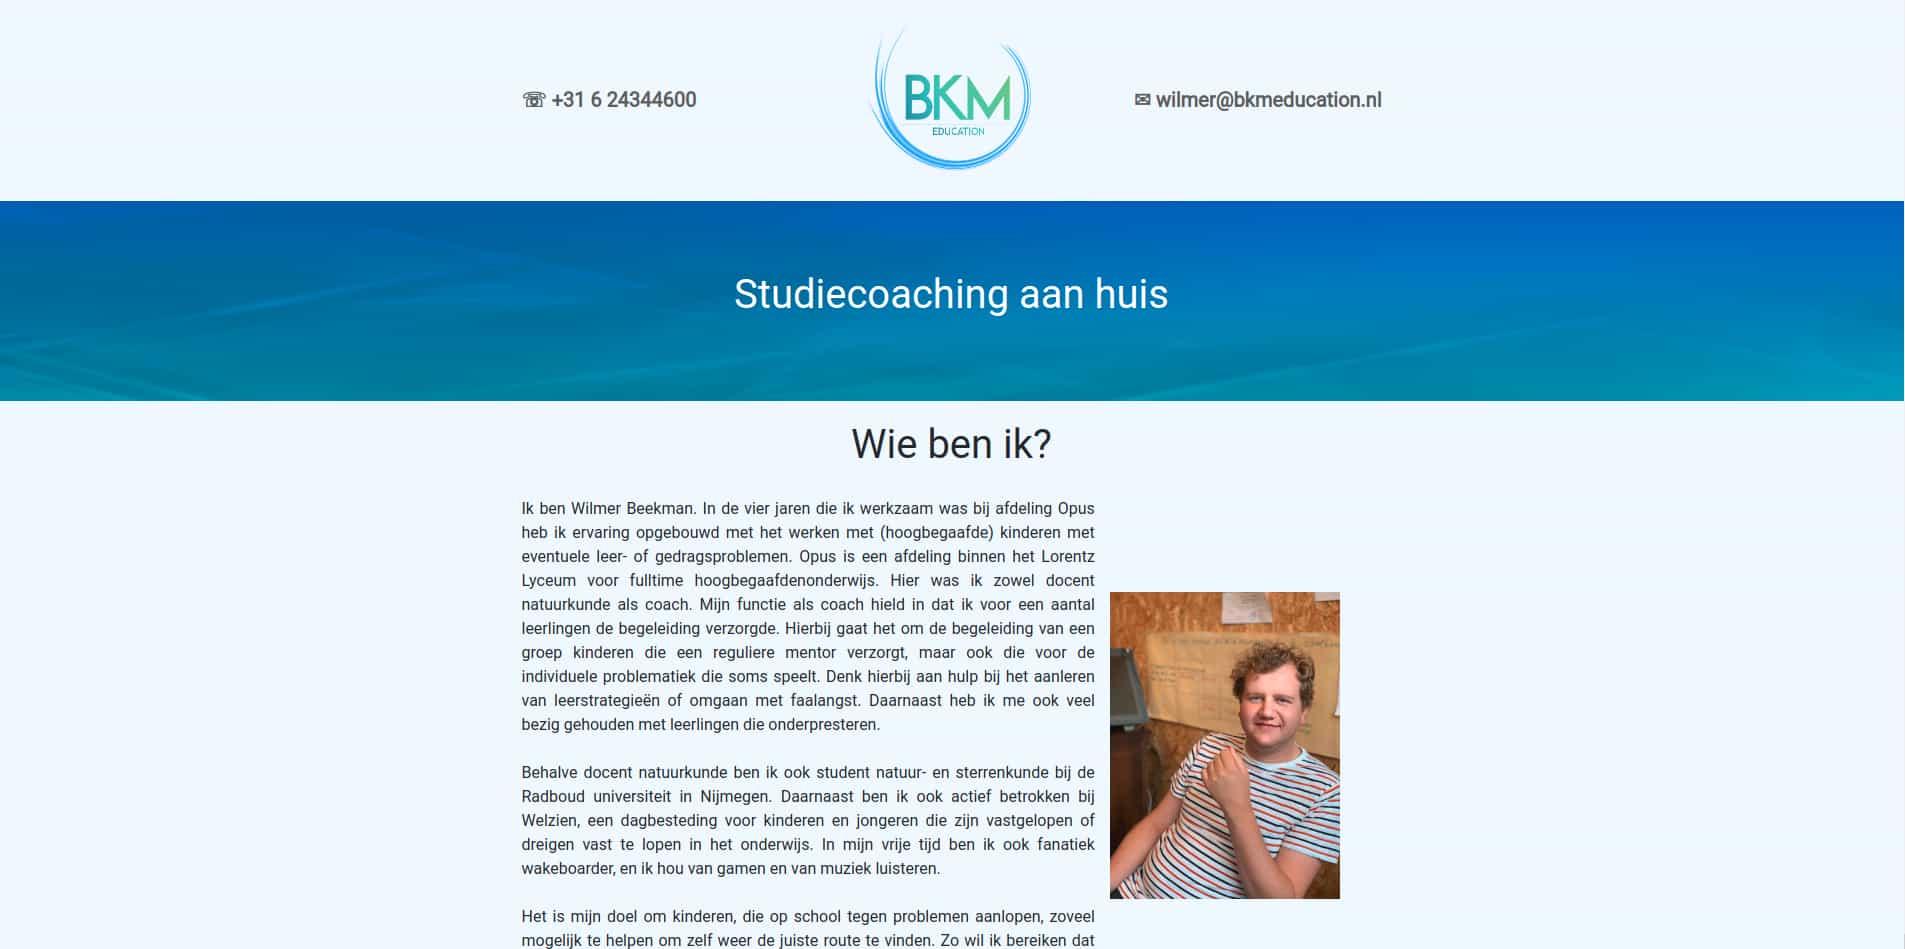 BKM Education